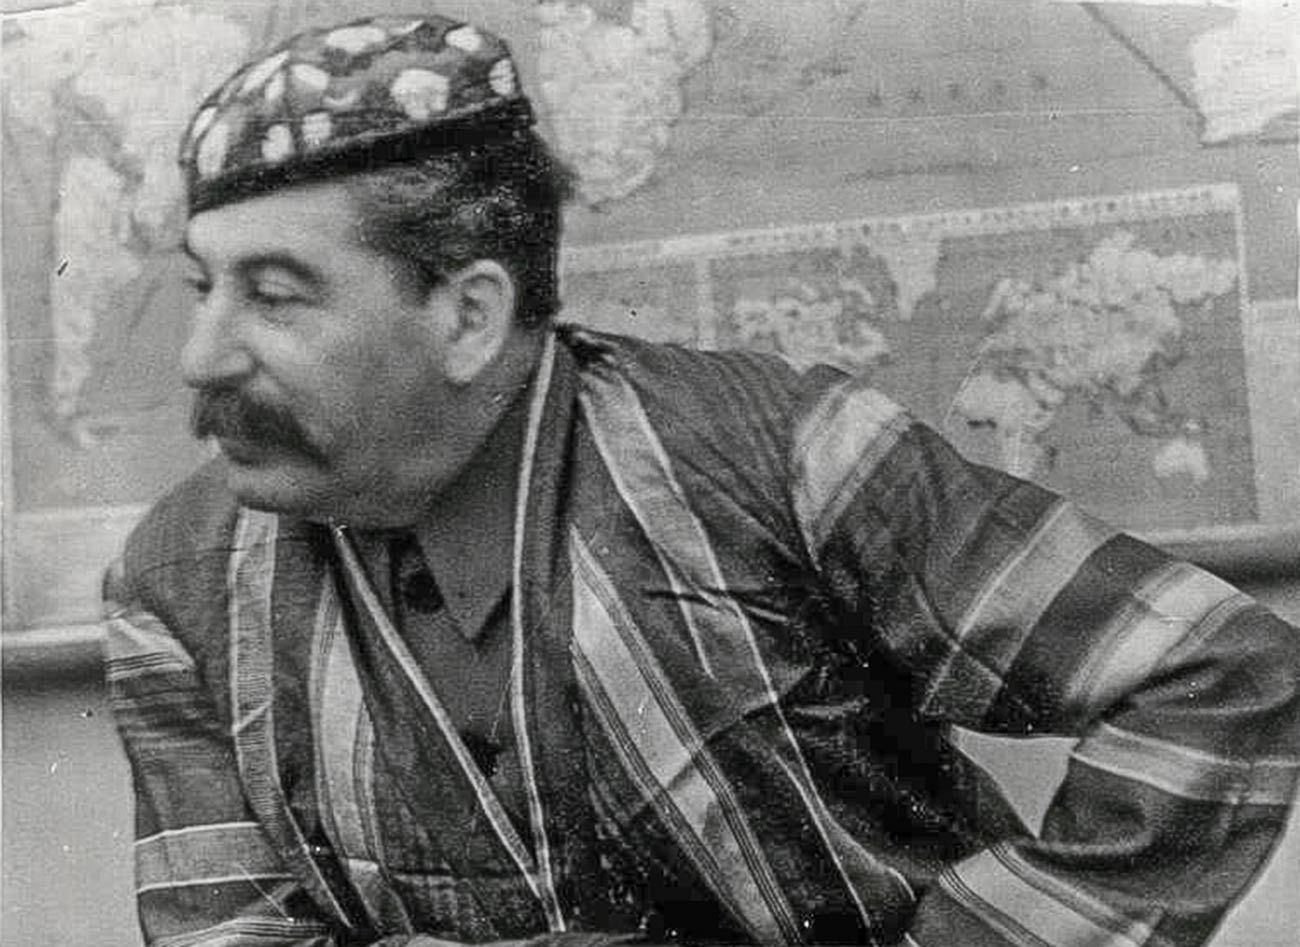 Josef Stalin mengenakan pakaian nasional Uzbek, 1930-an.